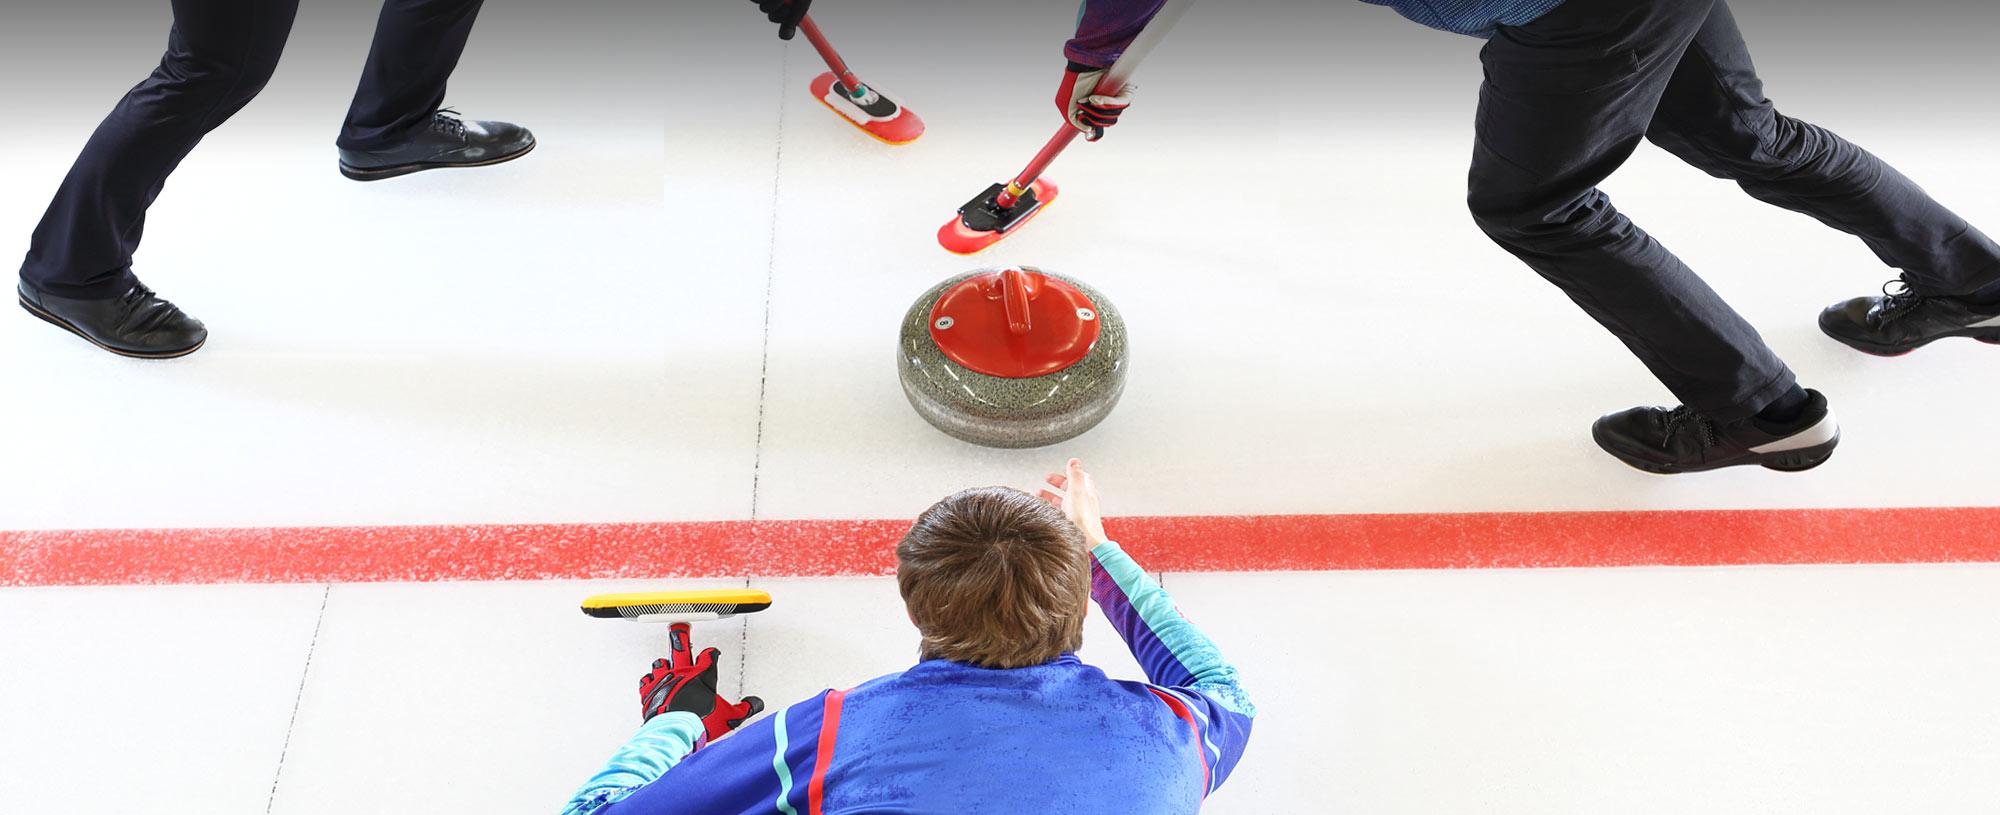 curling chatham 5 2